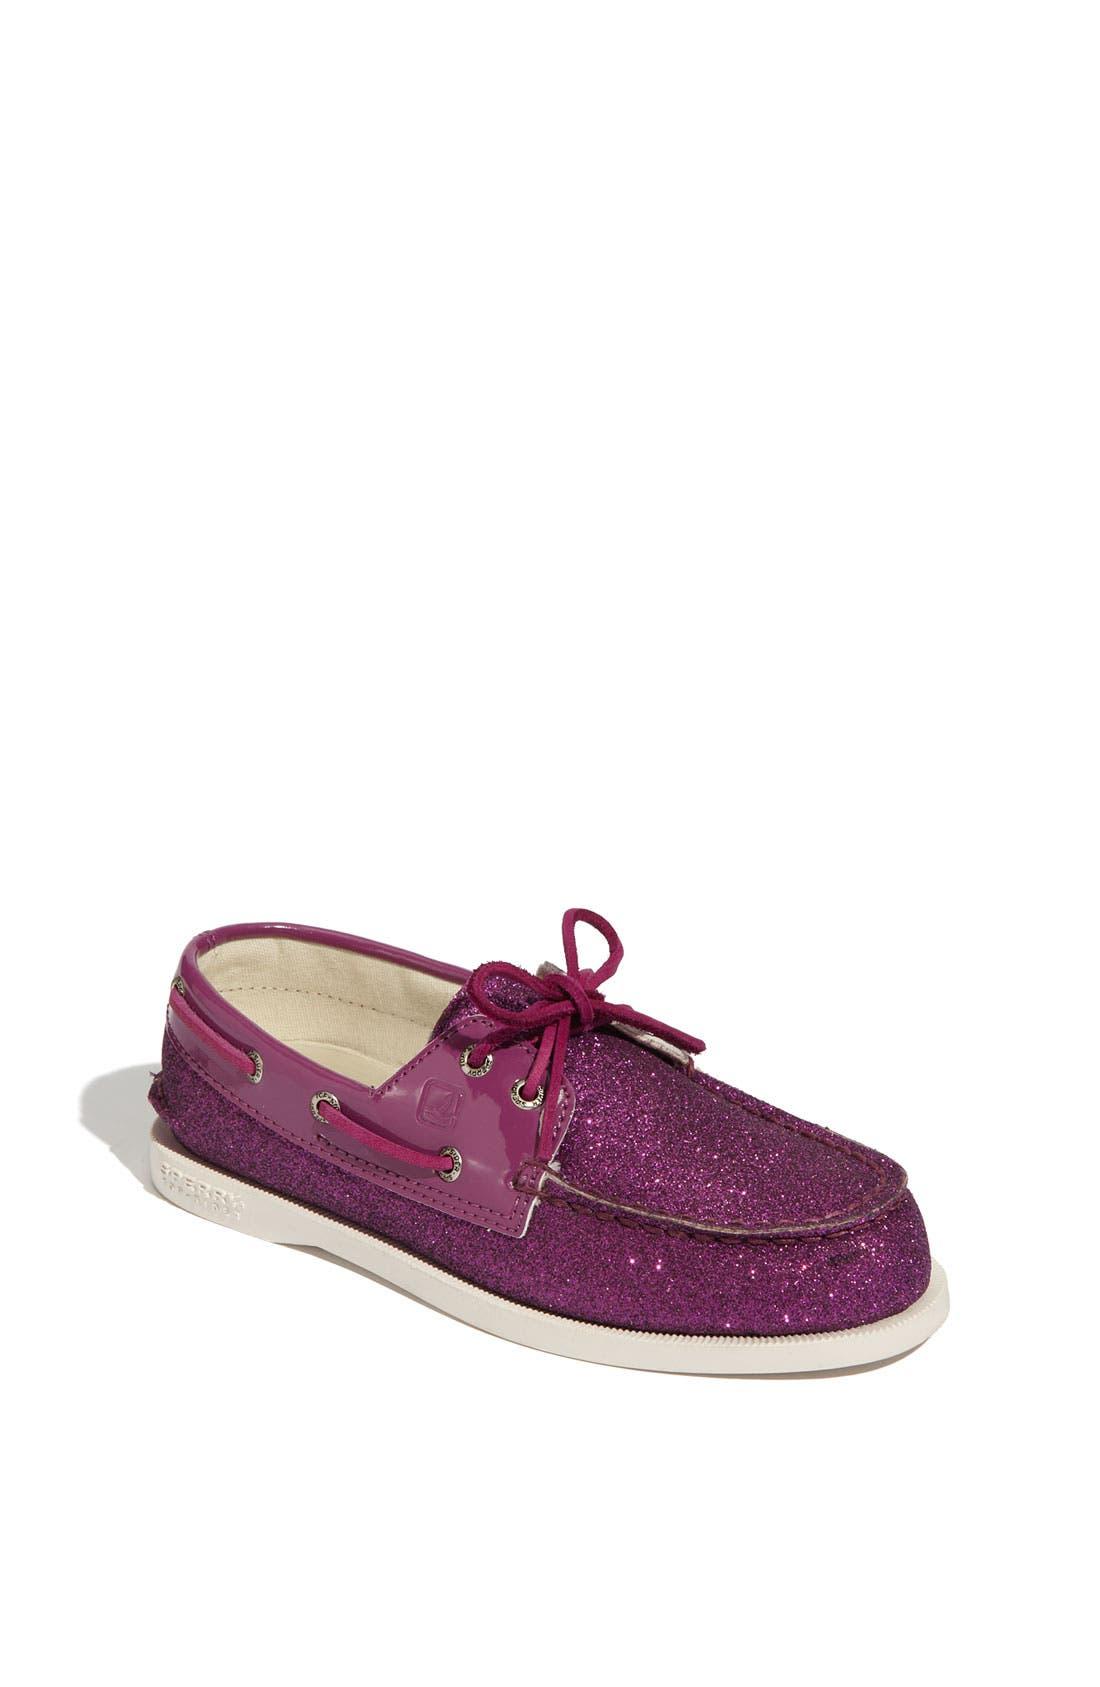 Alternate Image 1 Selected - Sperry Top-Sider® 'Authentic Original' Glitter Boat Shoe (Toddler, Little Kid & Big Kid)